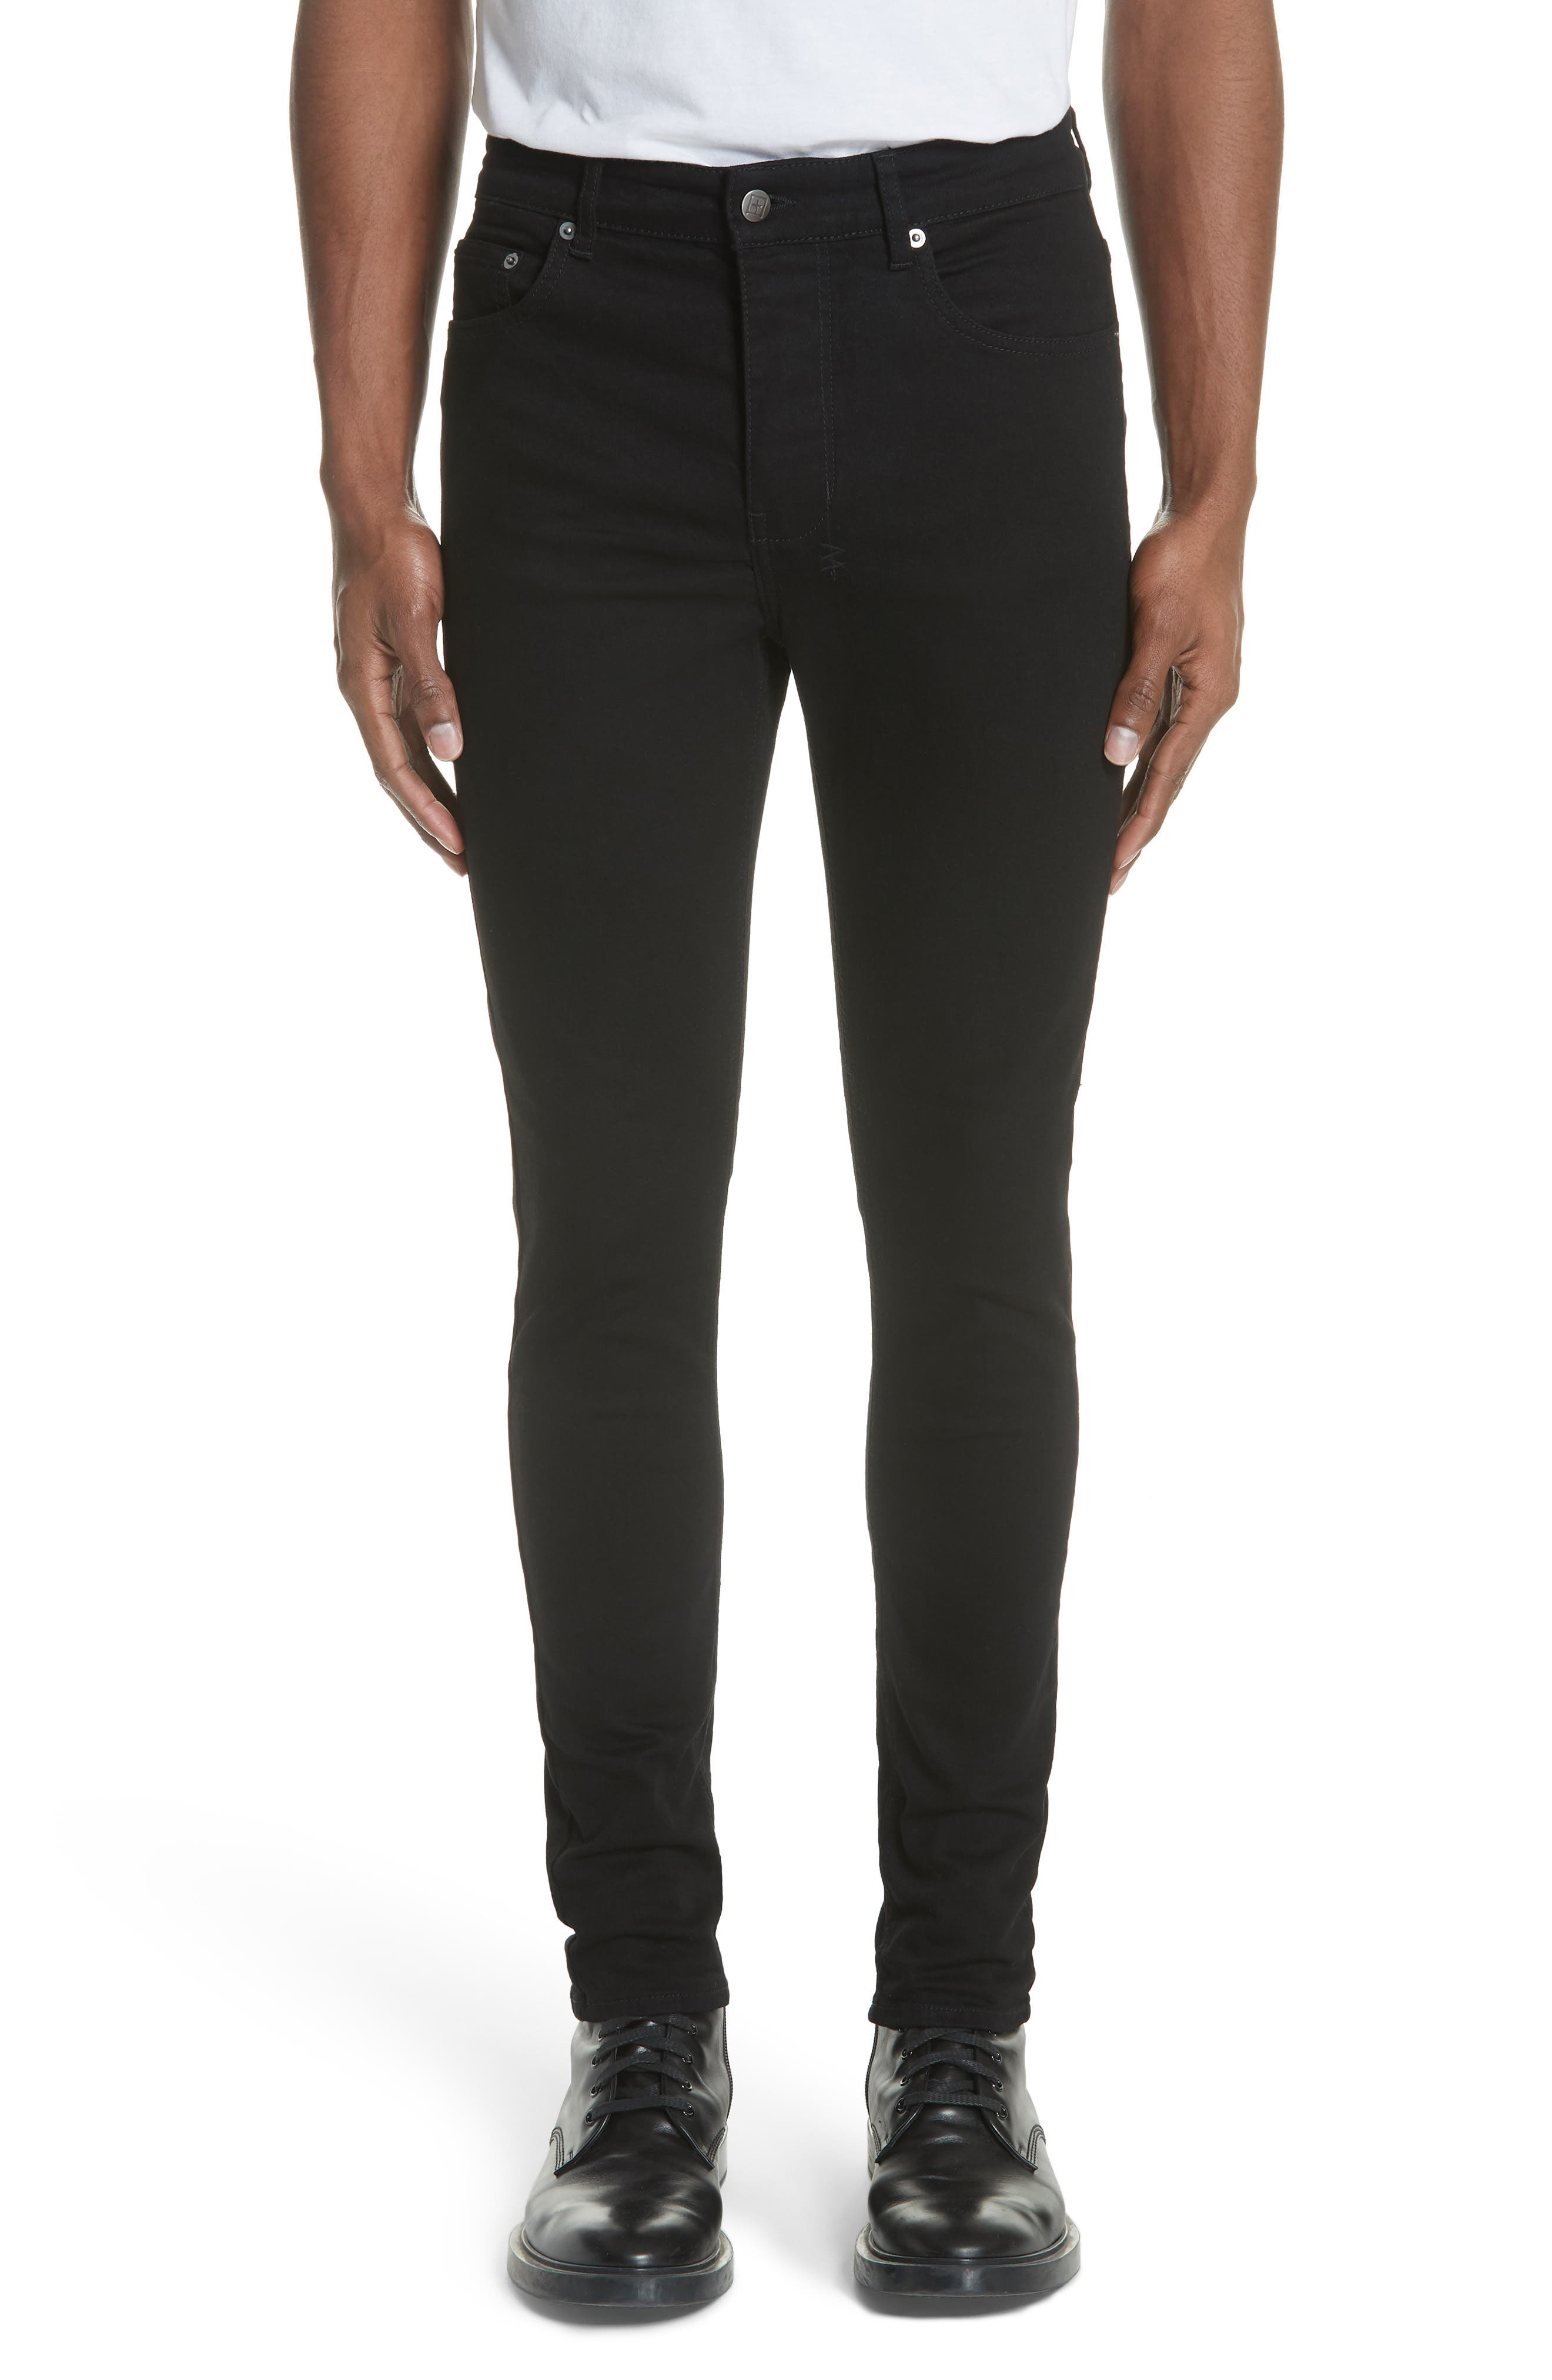 Men's Ksubi Chitch Laid Skinny Fit Jeans,  28 - Black